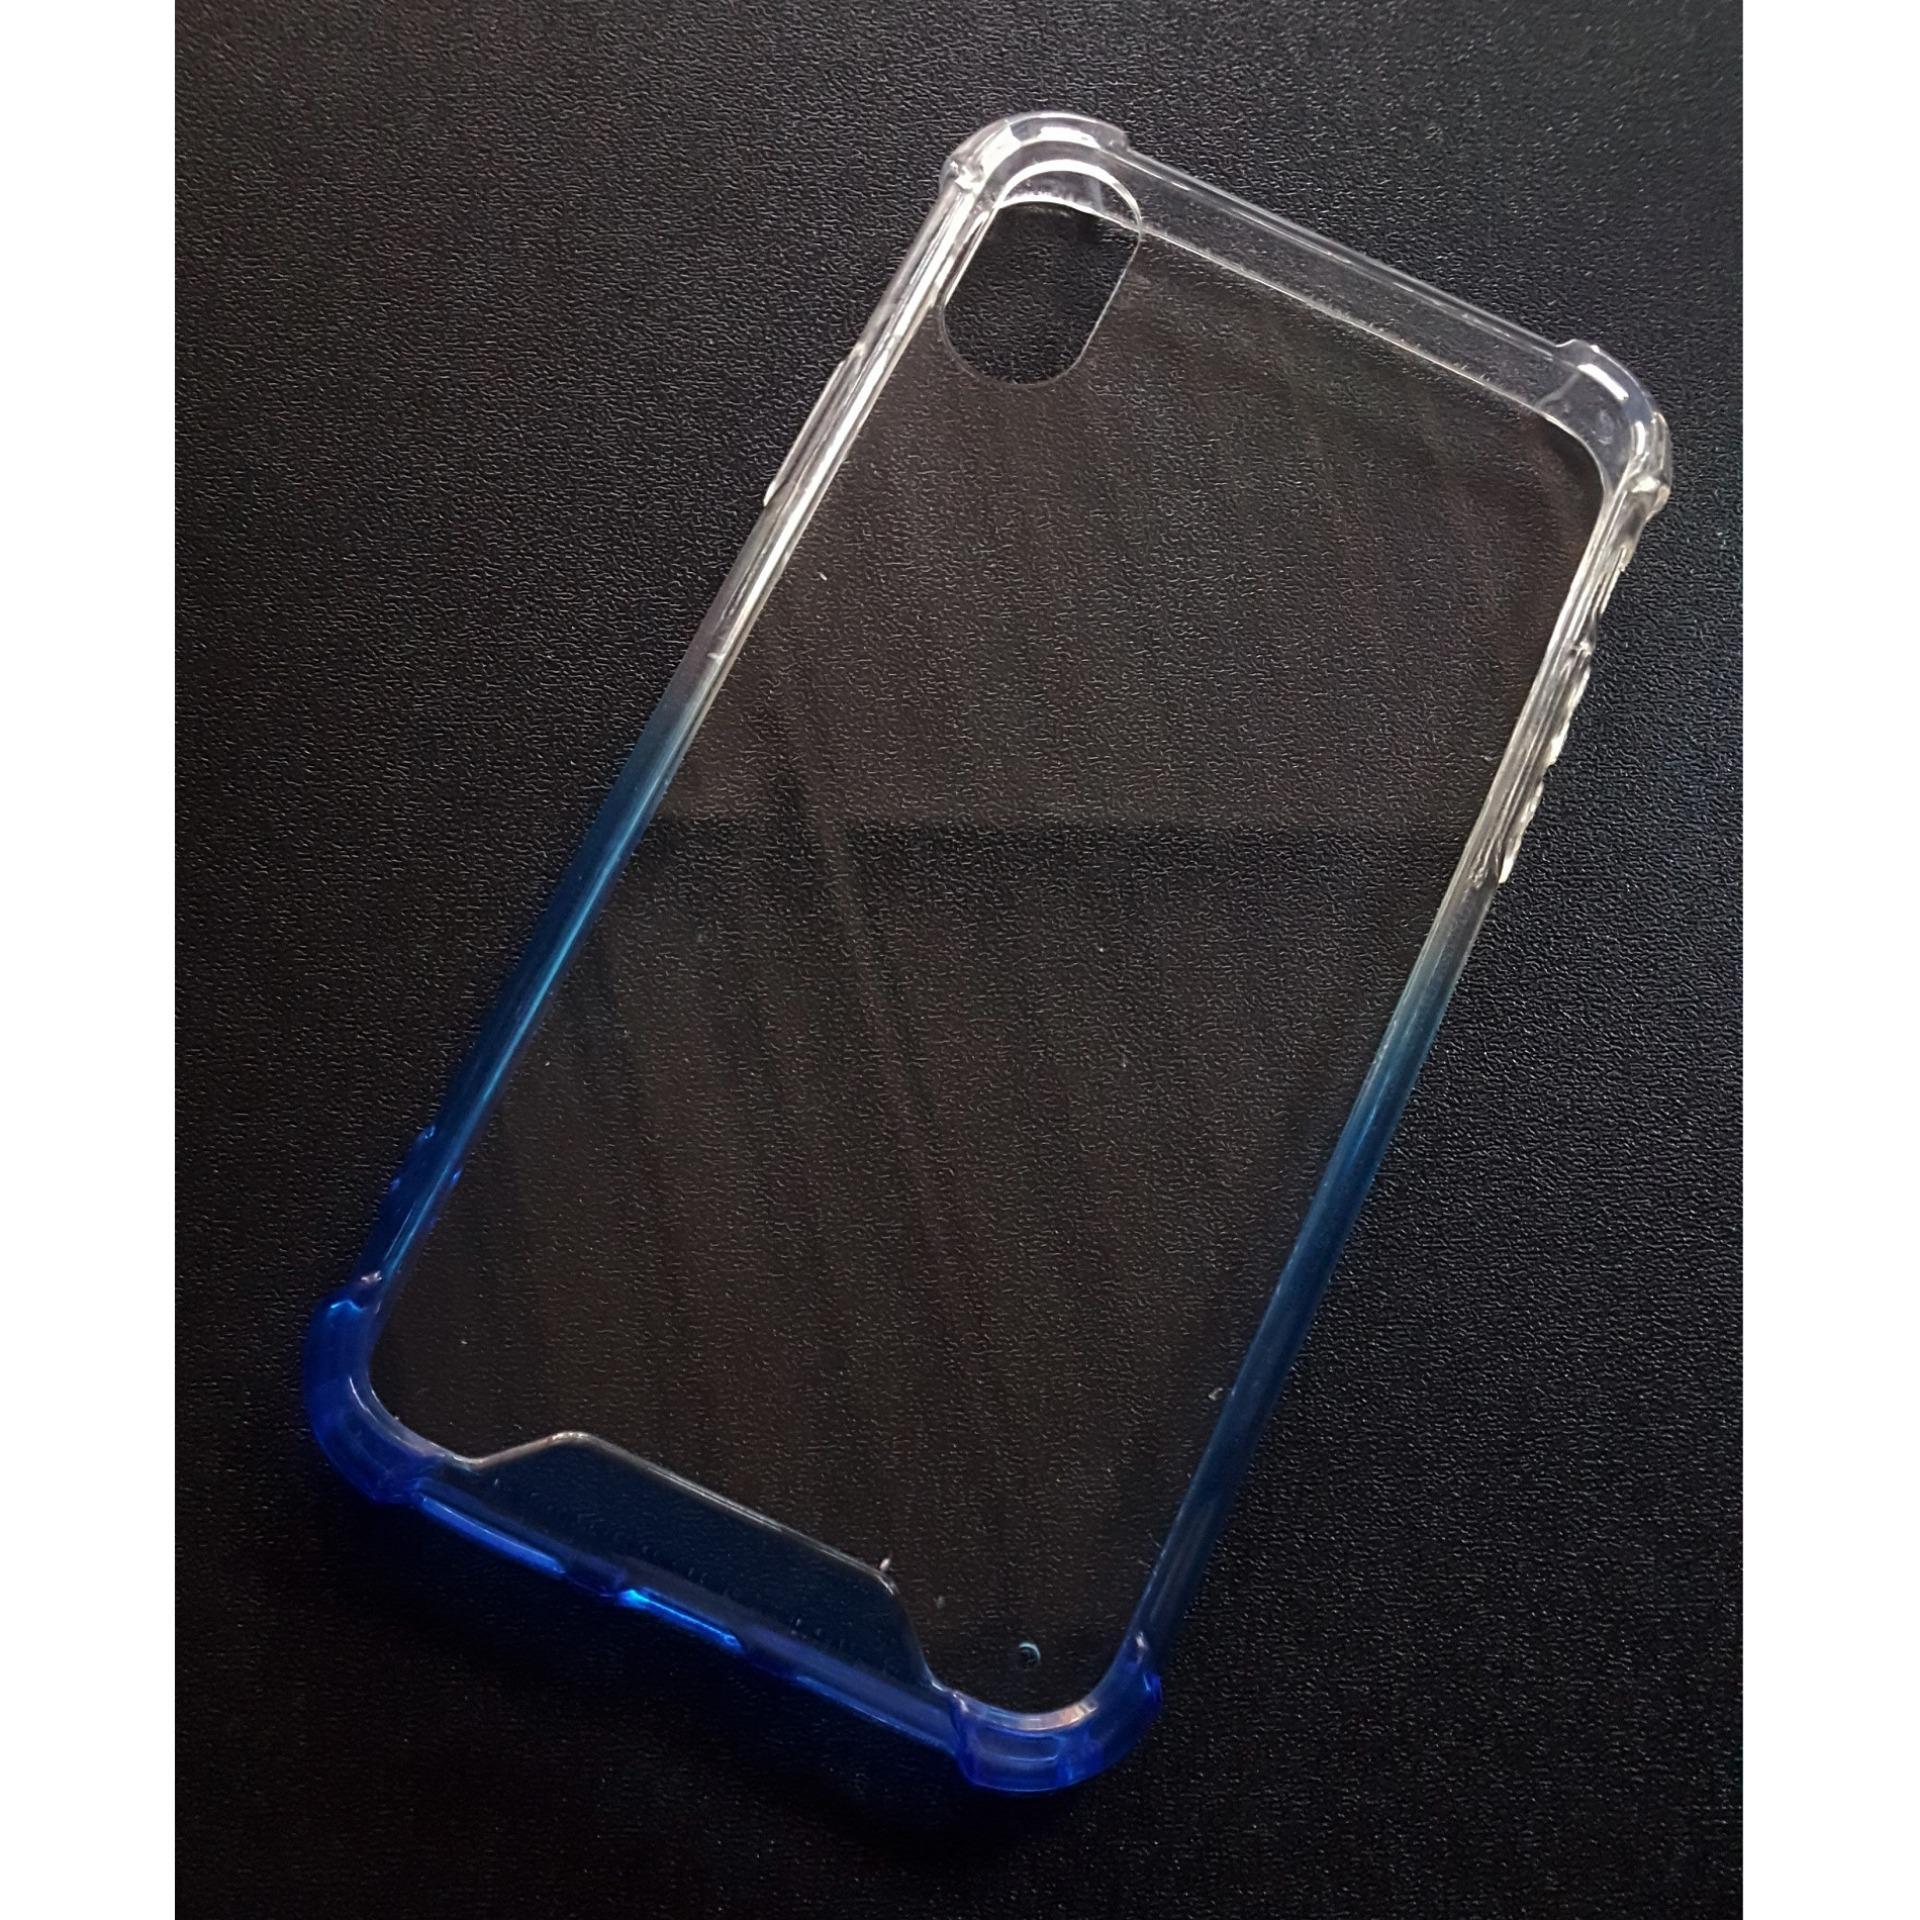 Harga Case Caseology Lg G4 Hardcase Soft Hard Anti Crack Shock Setelan Kodok Panda 1125 Transparant Fashion Apple Iphone X Blue Premium